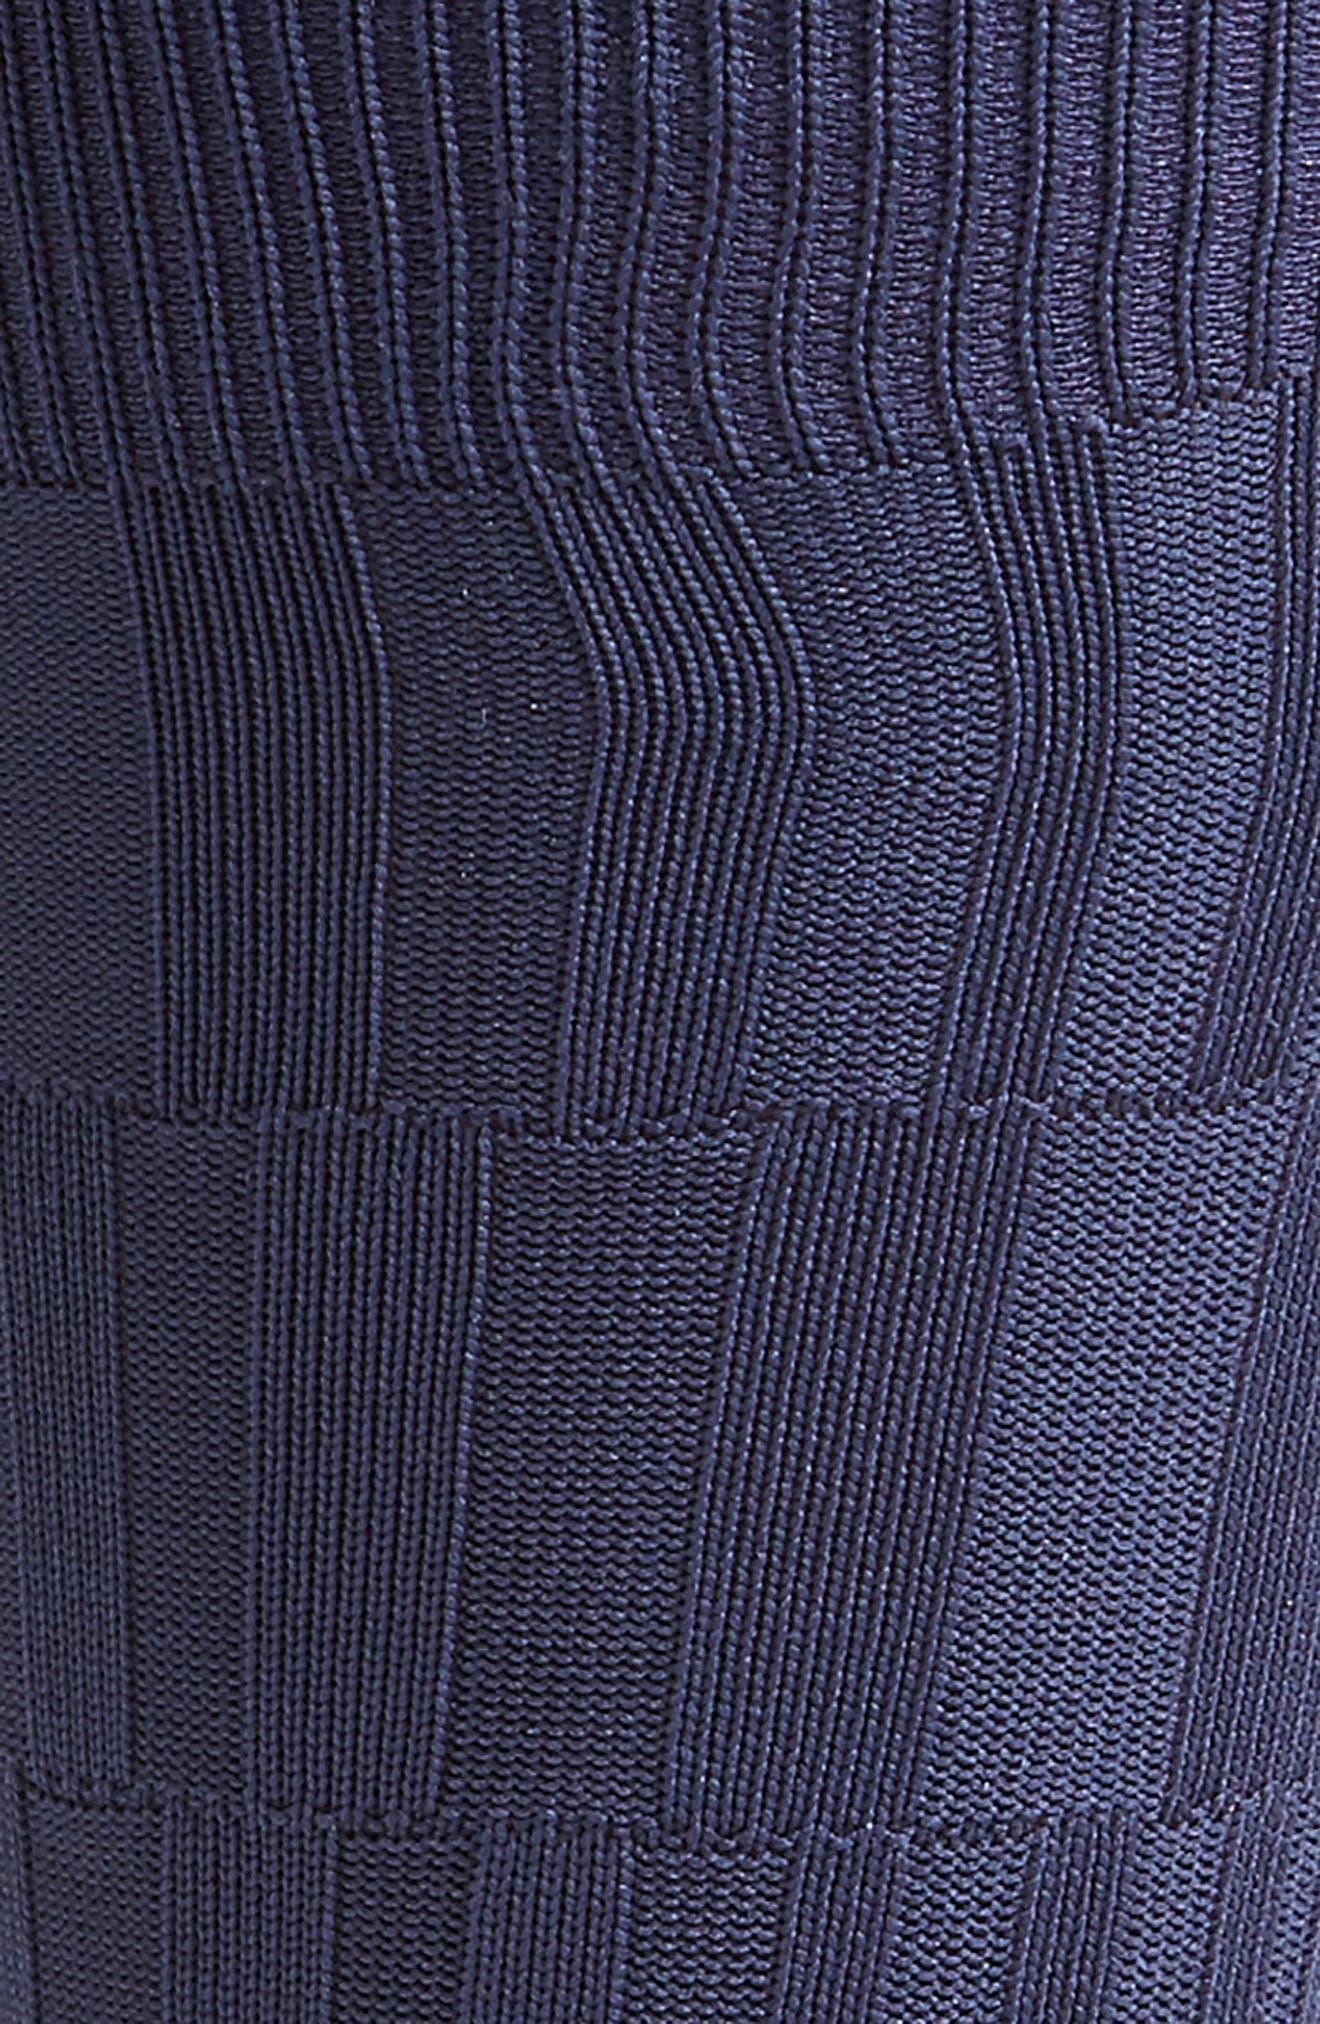 Bar Texture Socks,                             Alternate thumbnail 4, color,